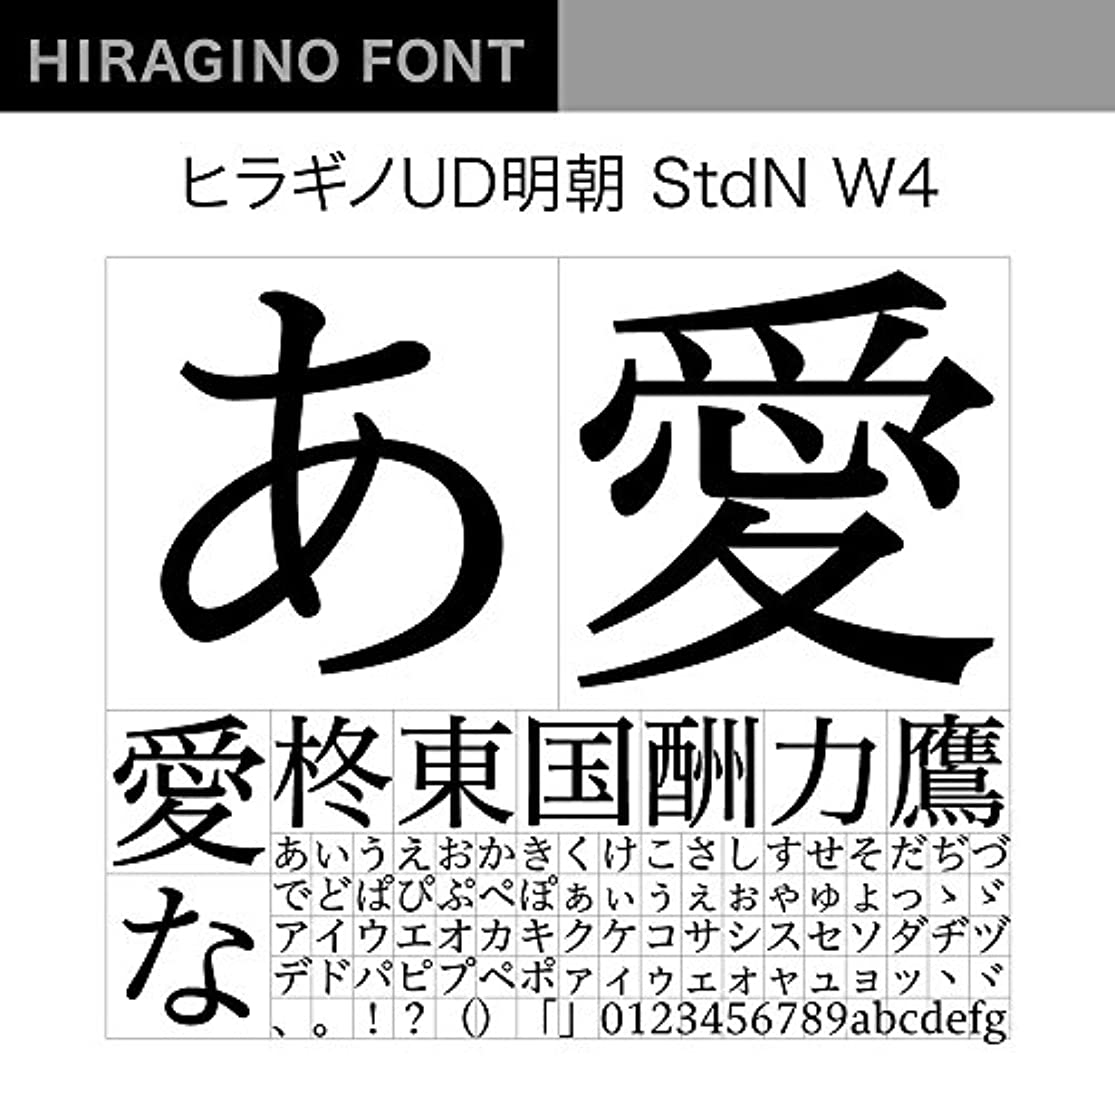 OpenType ヒラギノUD明朝 StdN W4 [ダウンロード]